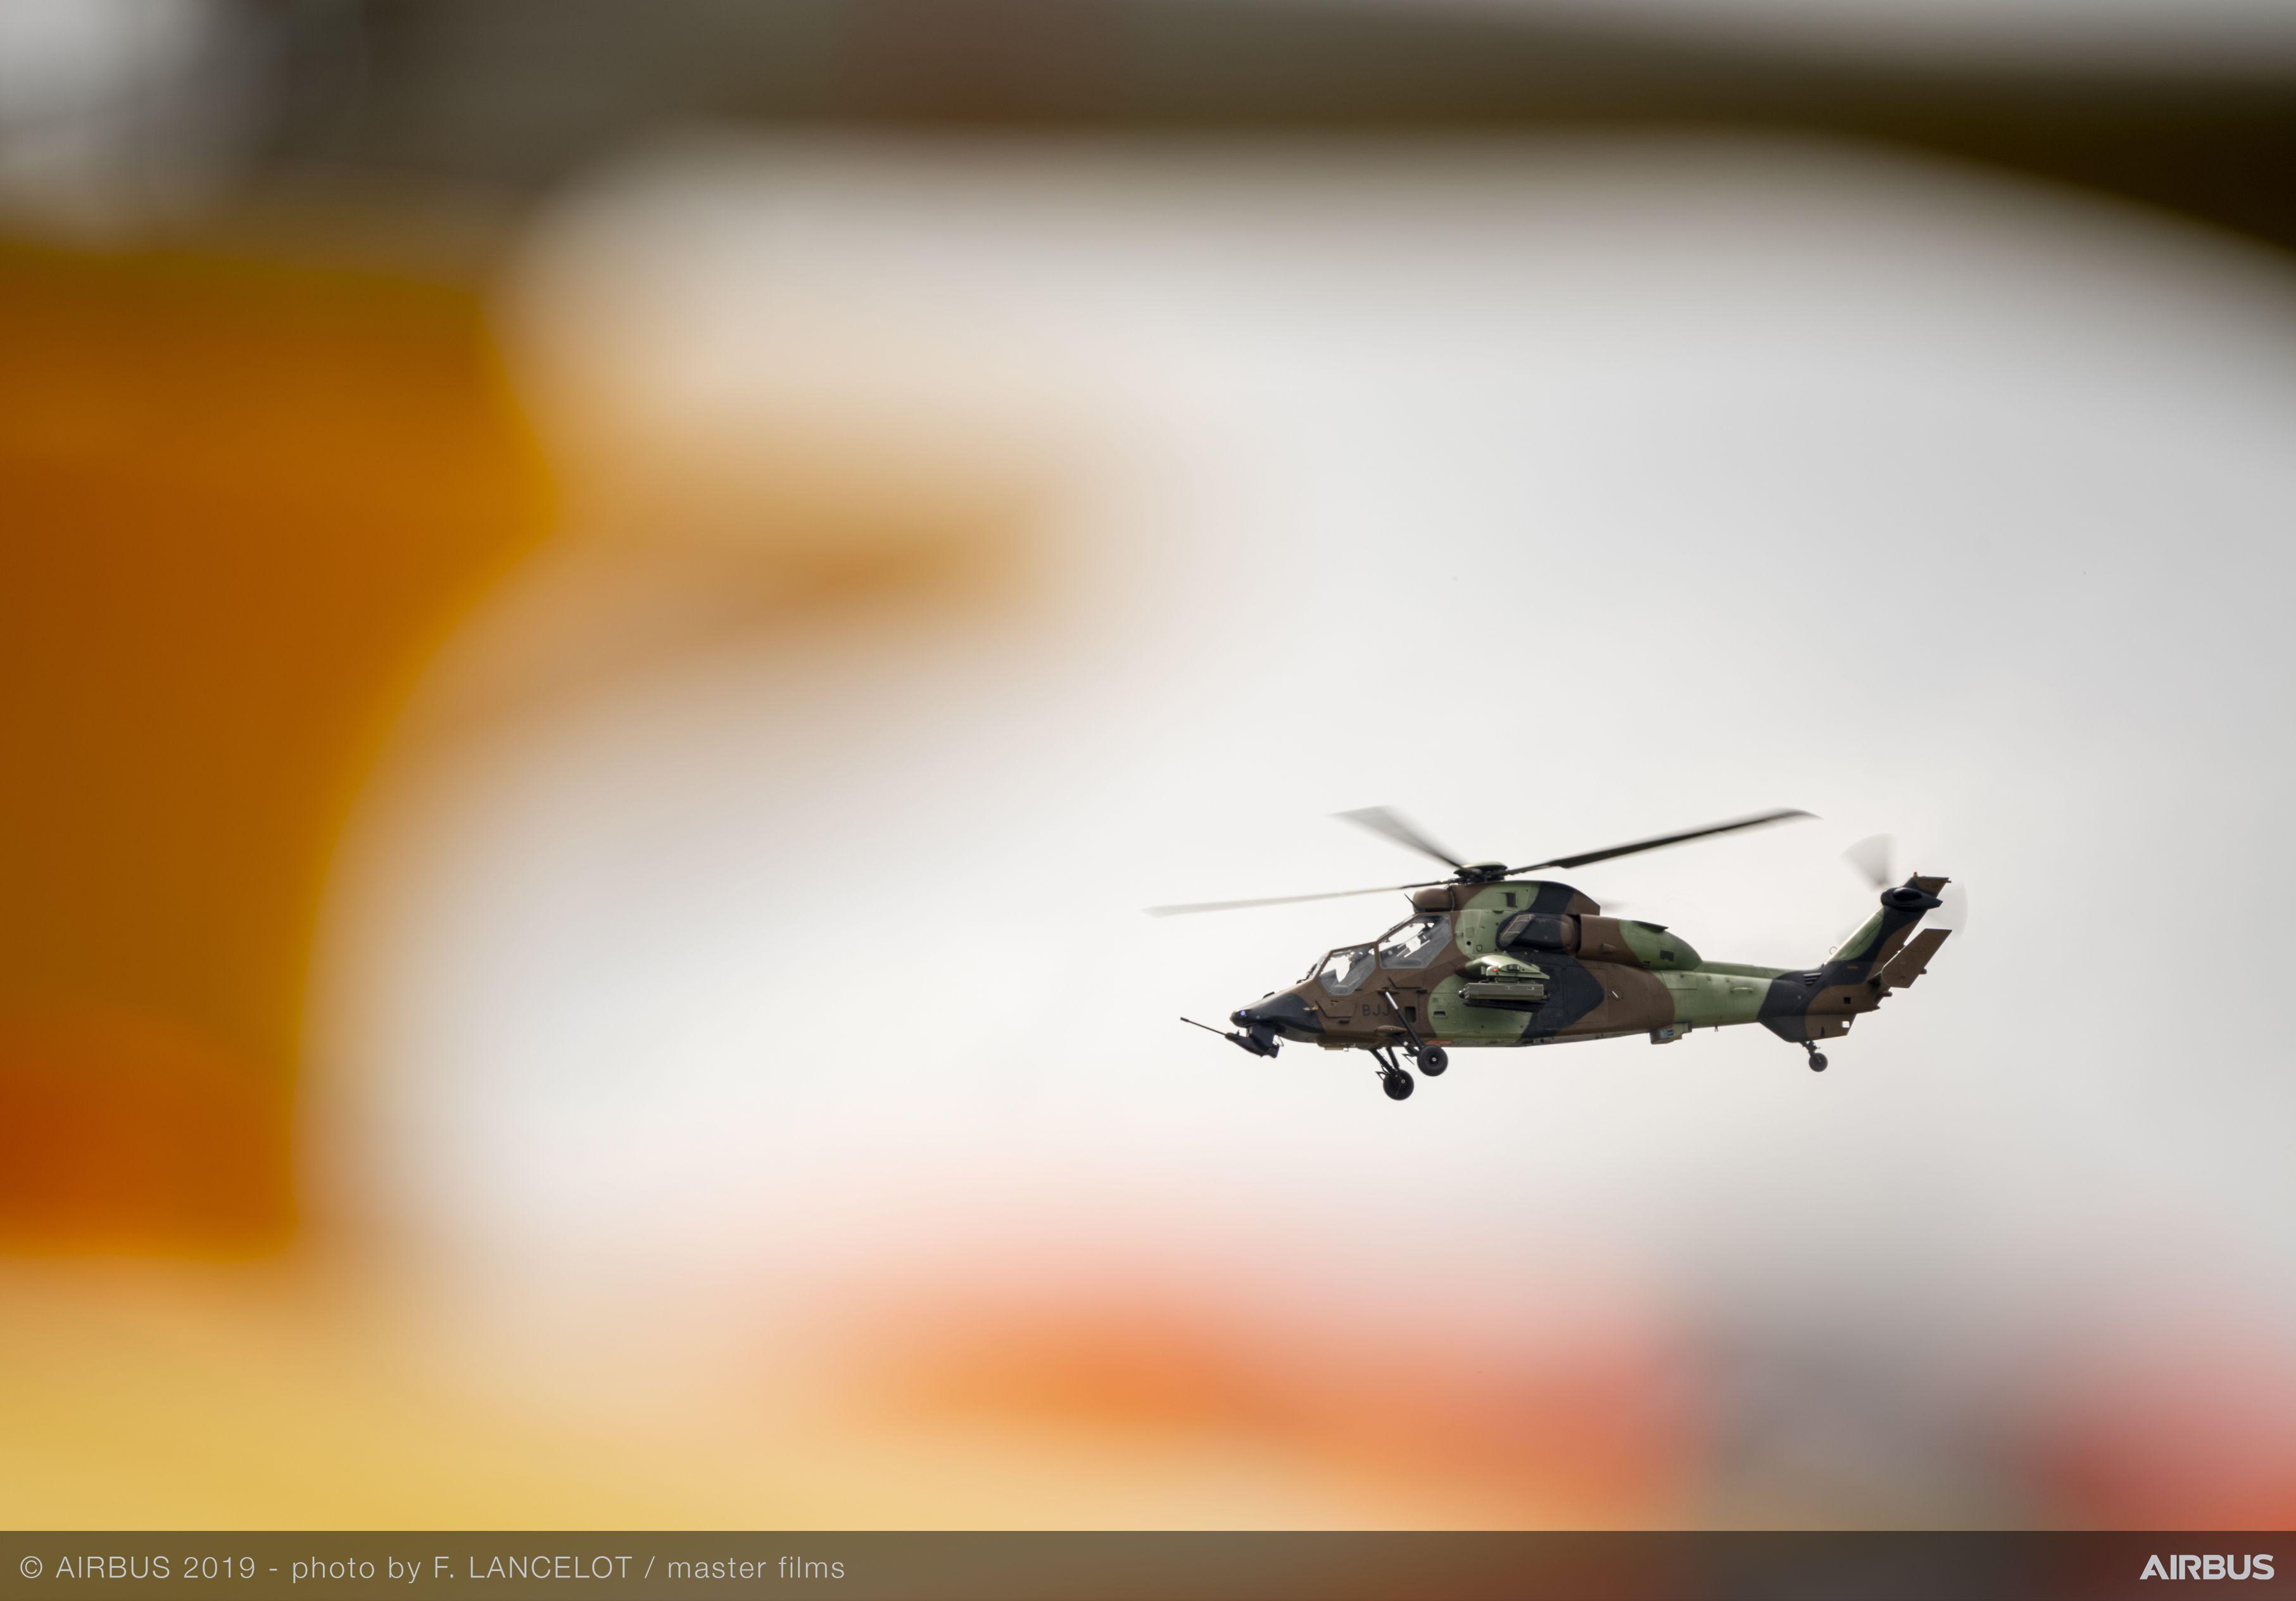 Tiger - Specialised - Airbus